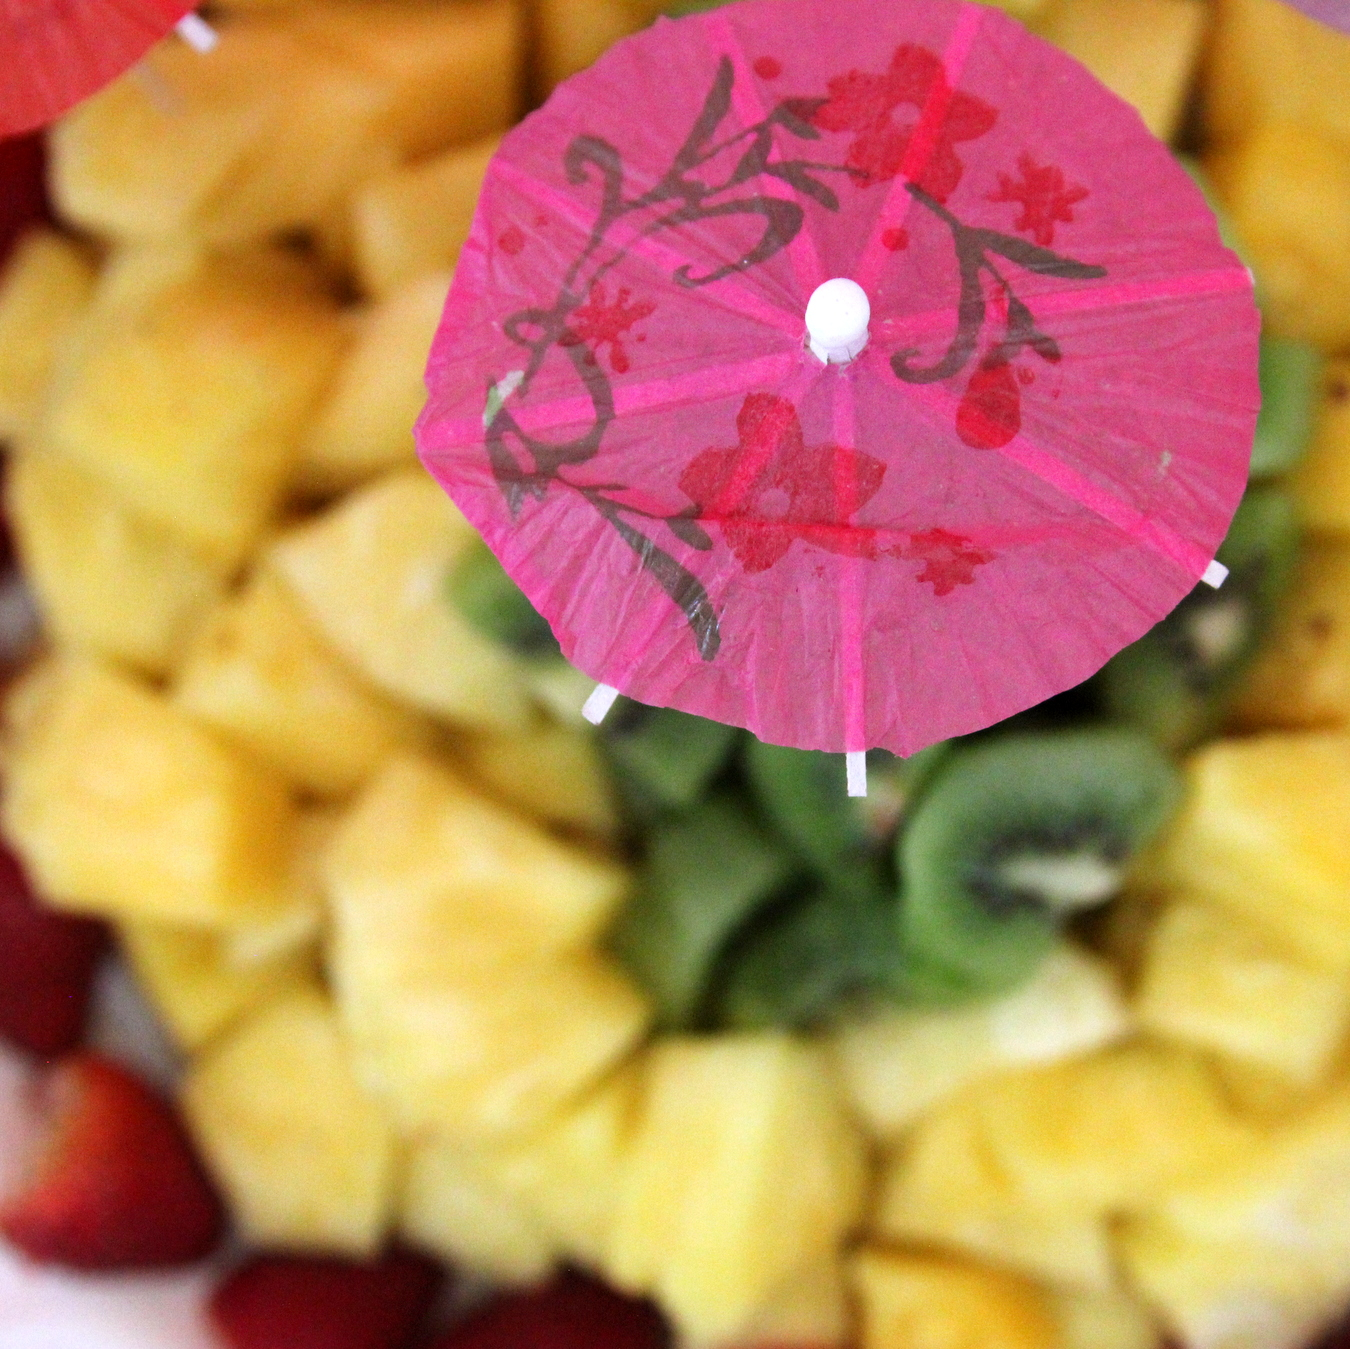 luau- the most tropical of hawaiian parties